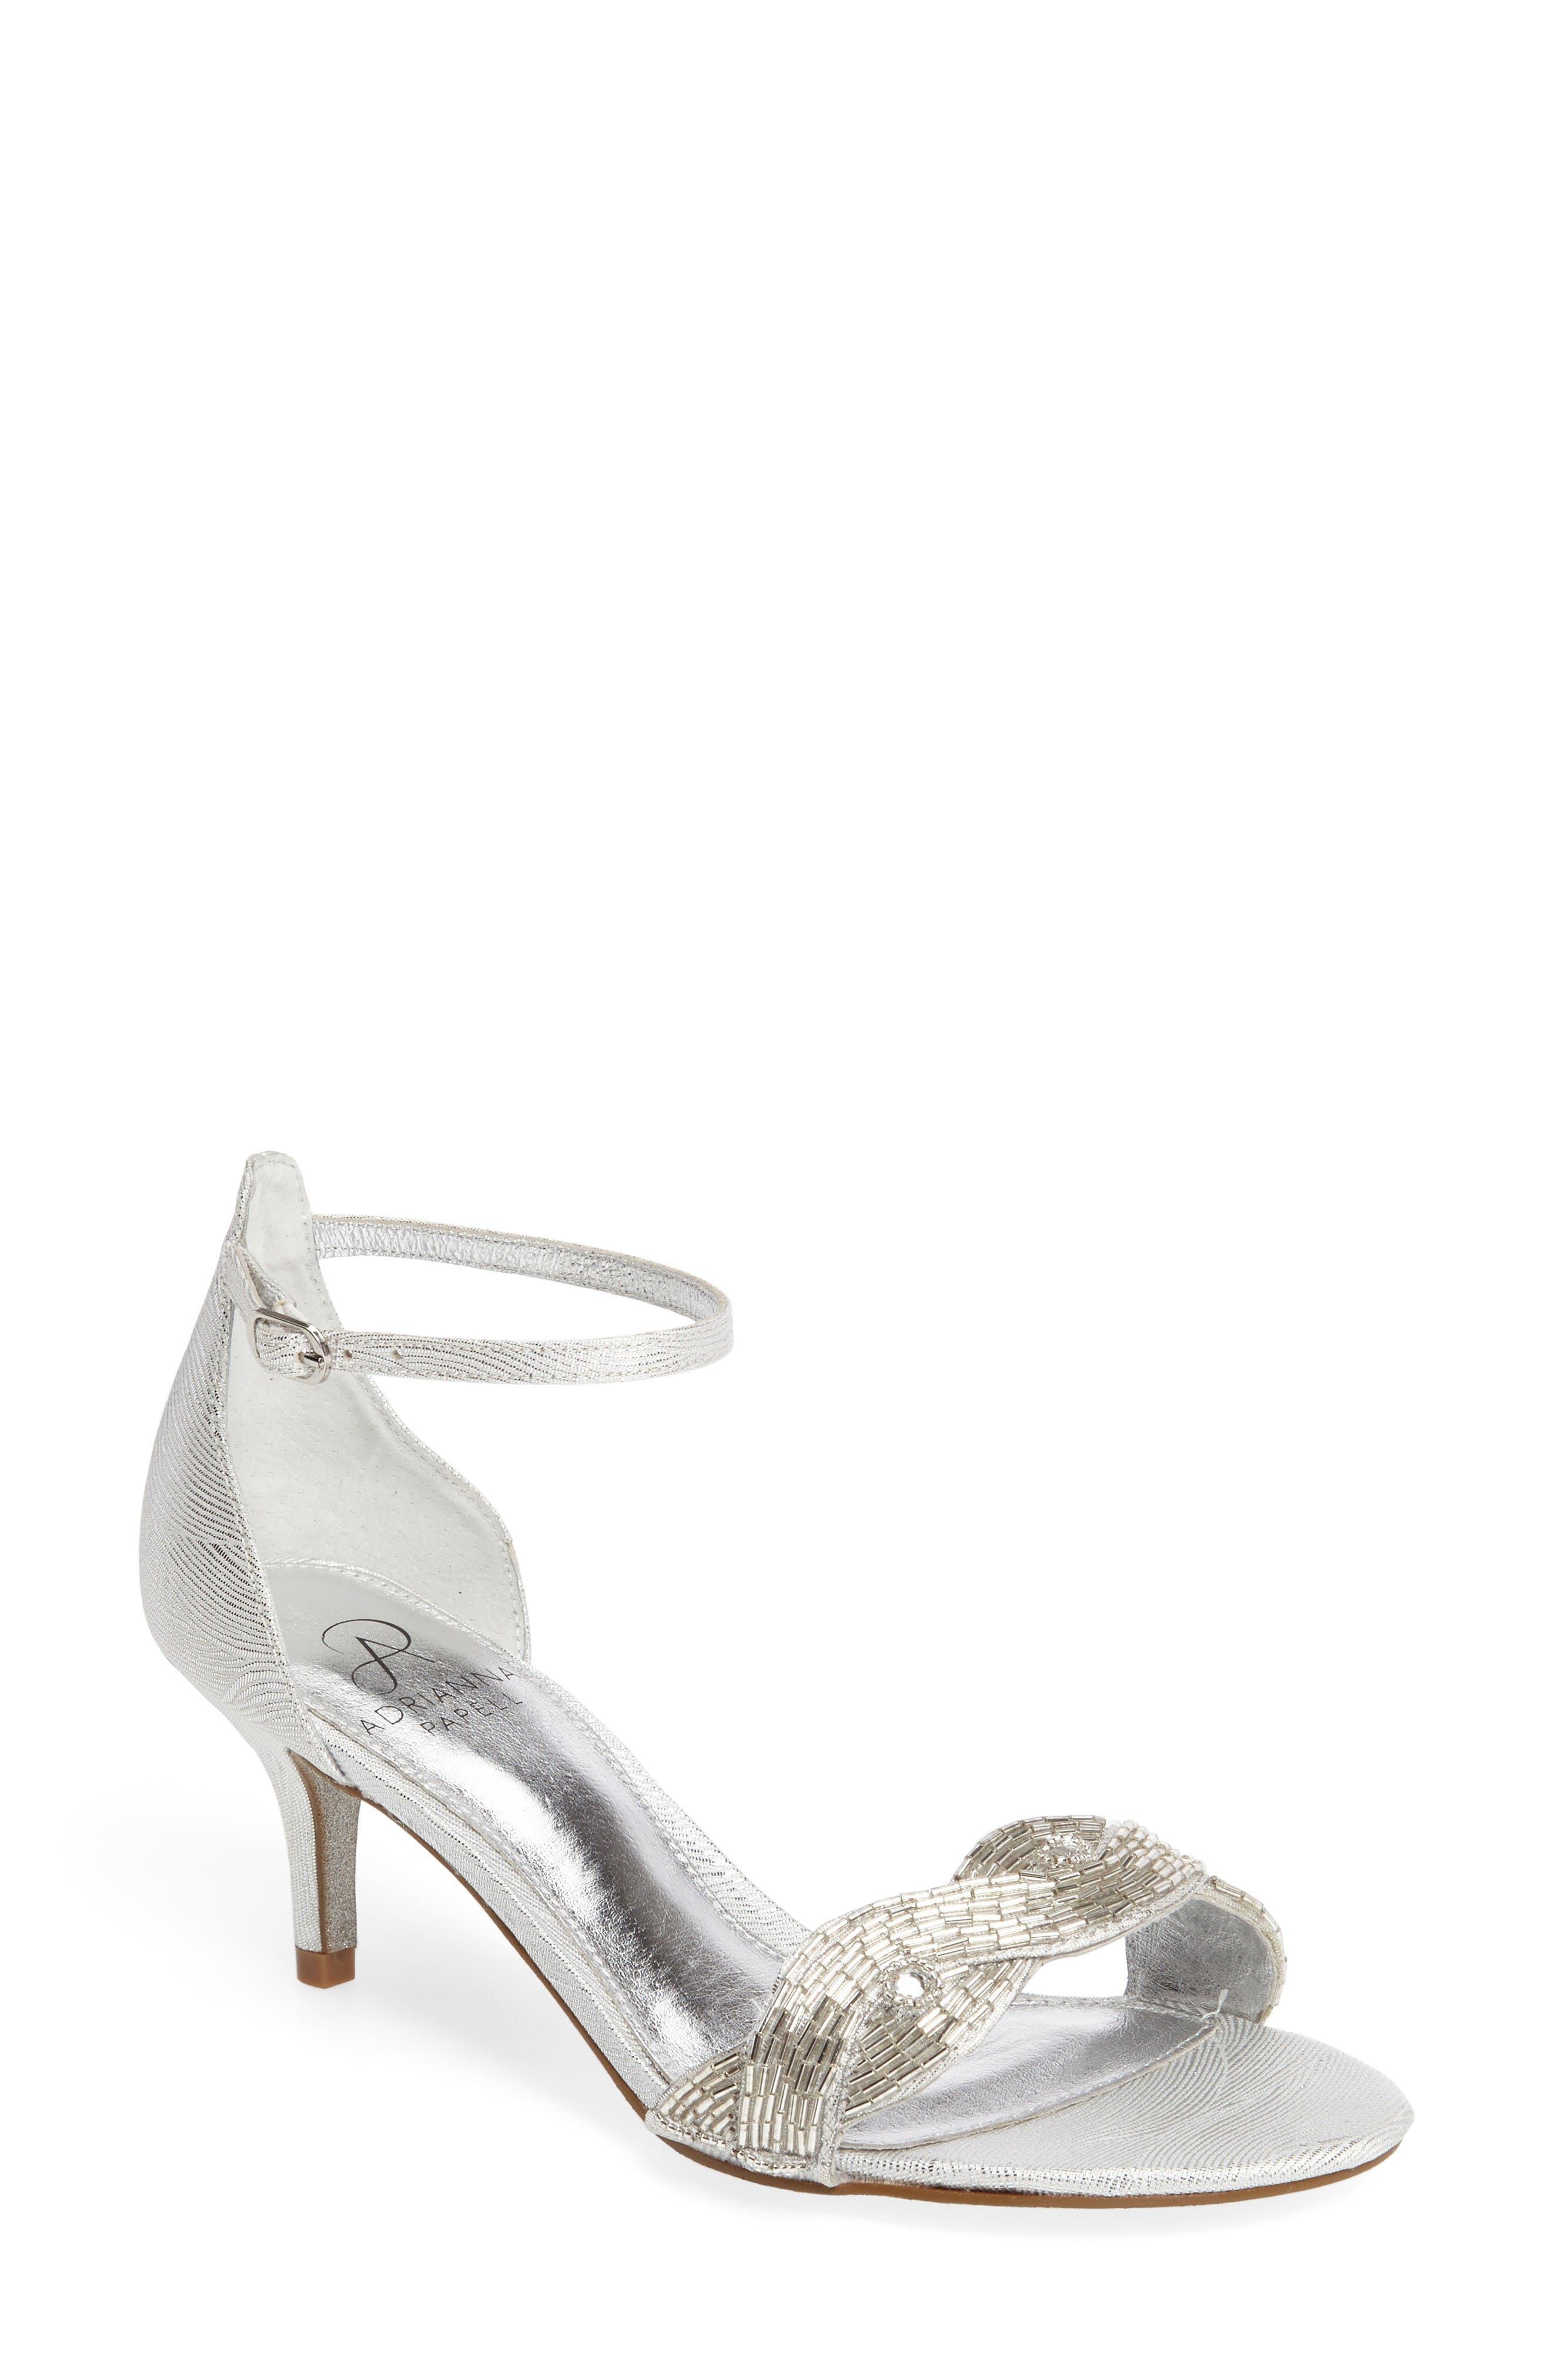 Adrianna Papell Aerin Embellished Sandal (Women)